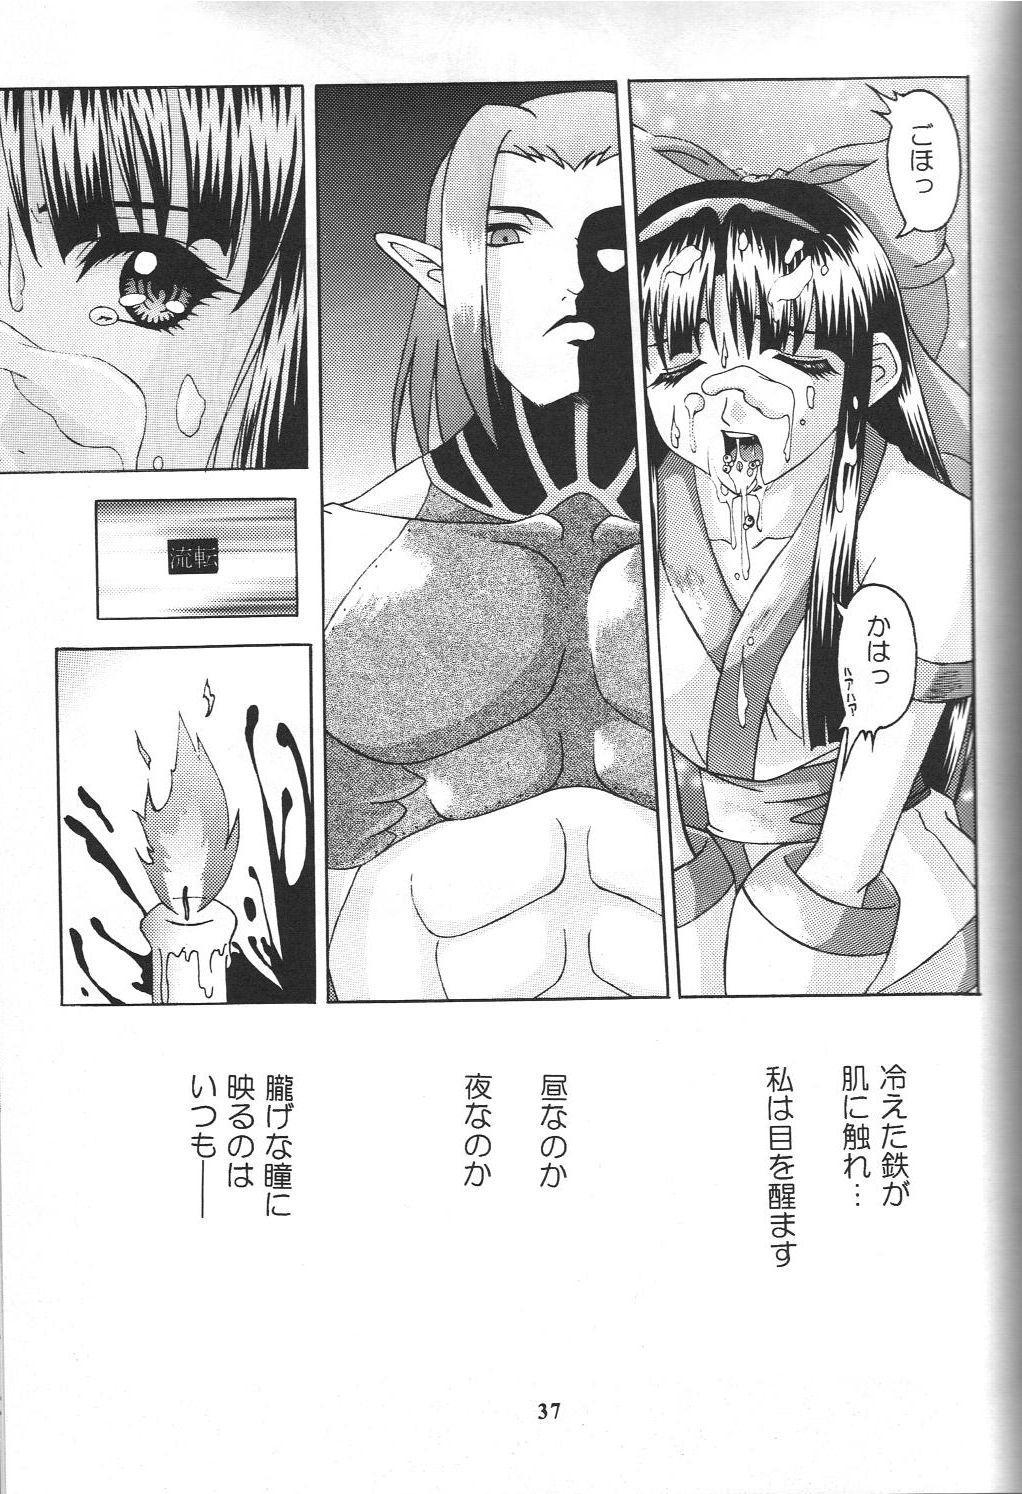 (C56) [Tsurikichi Doumei (Various)] Sengoku Rock - Nan Demo-R (Various) 37